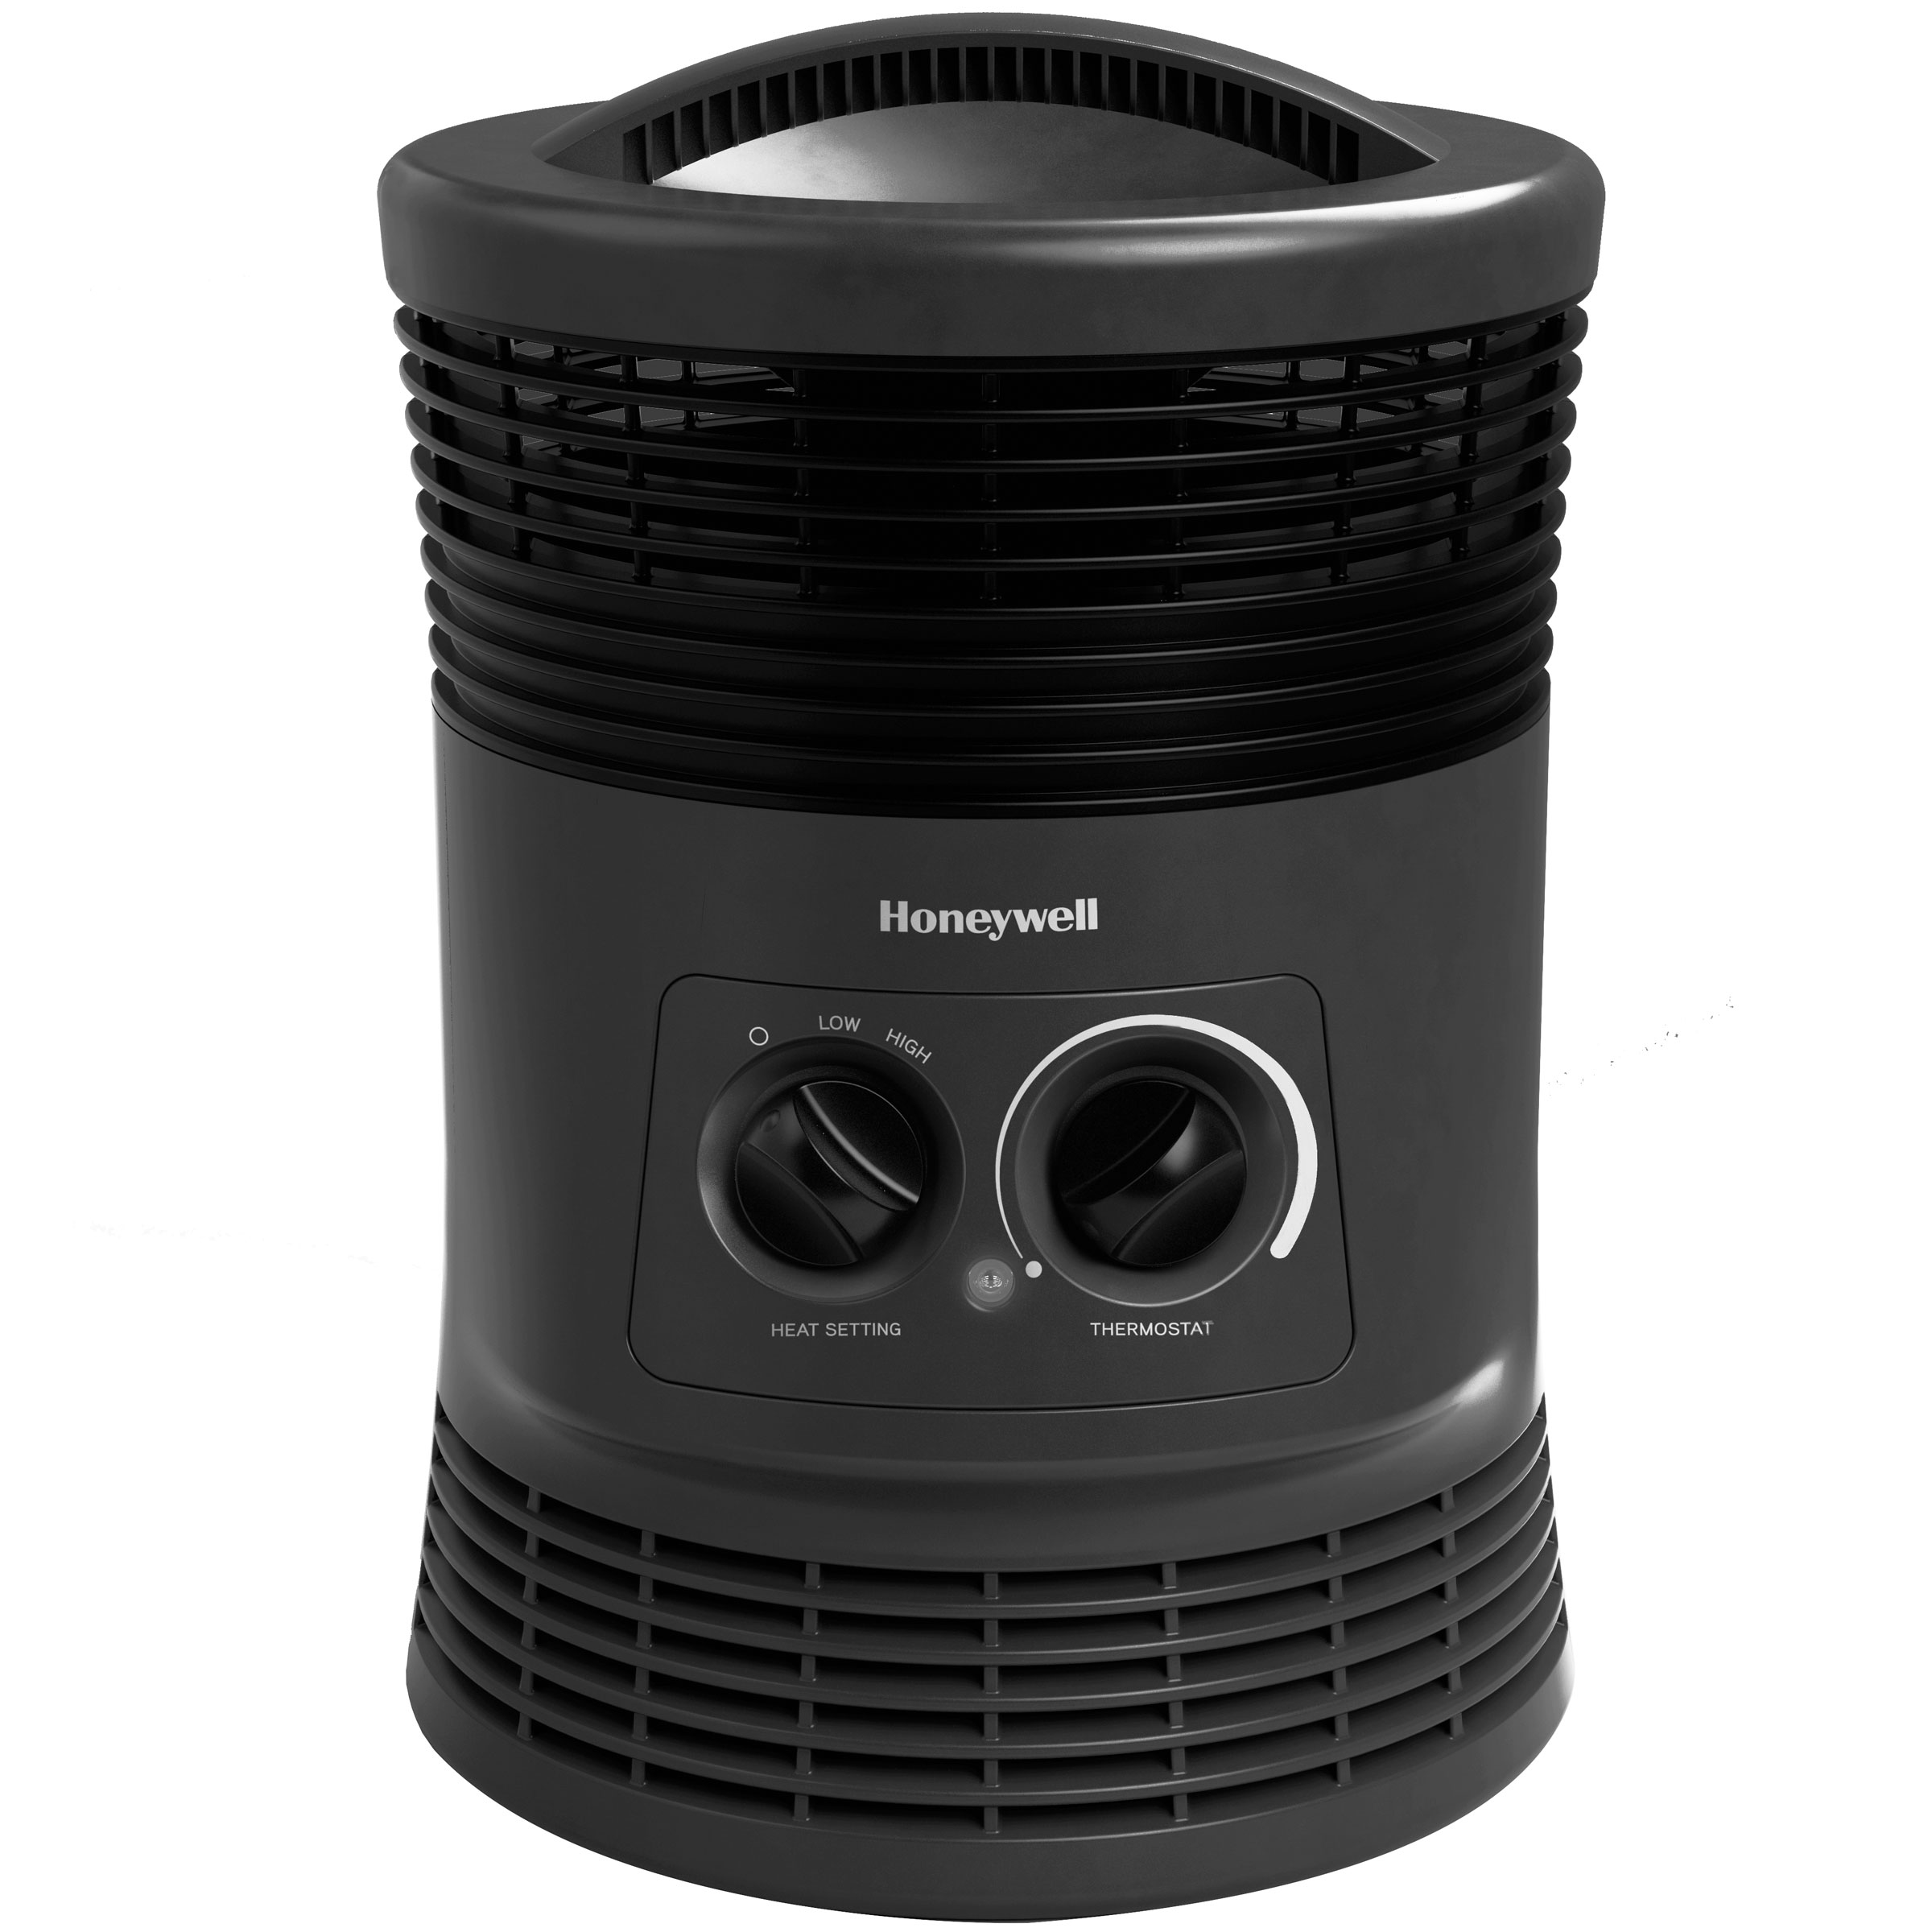 Honeywell 360 Degree Surround Heater, HHF360V, Black